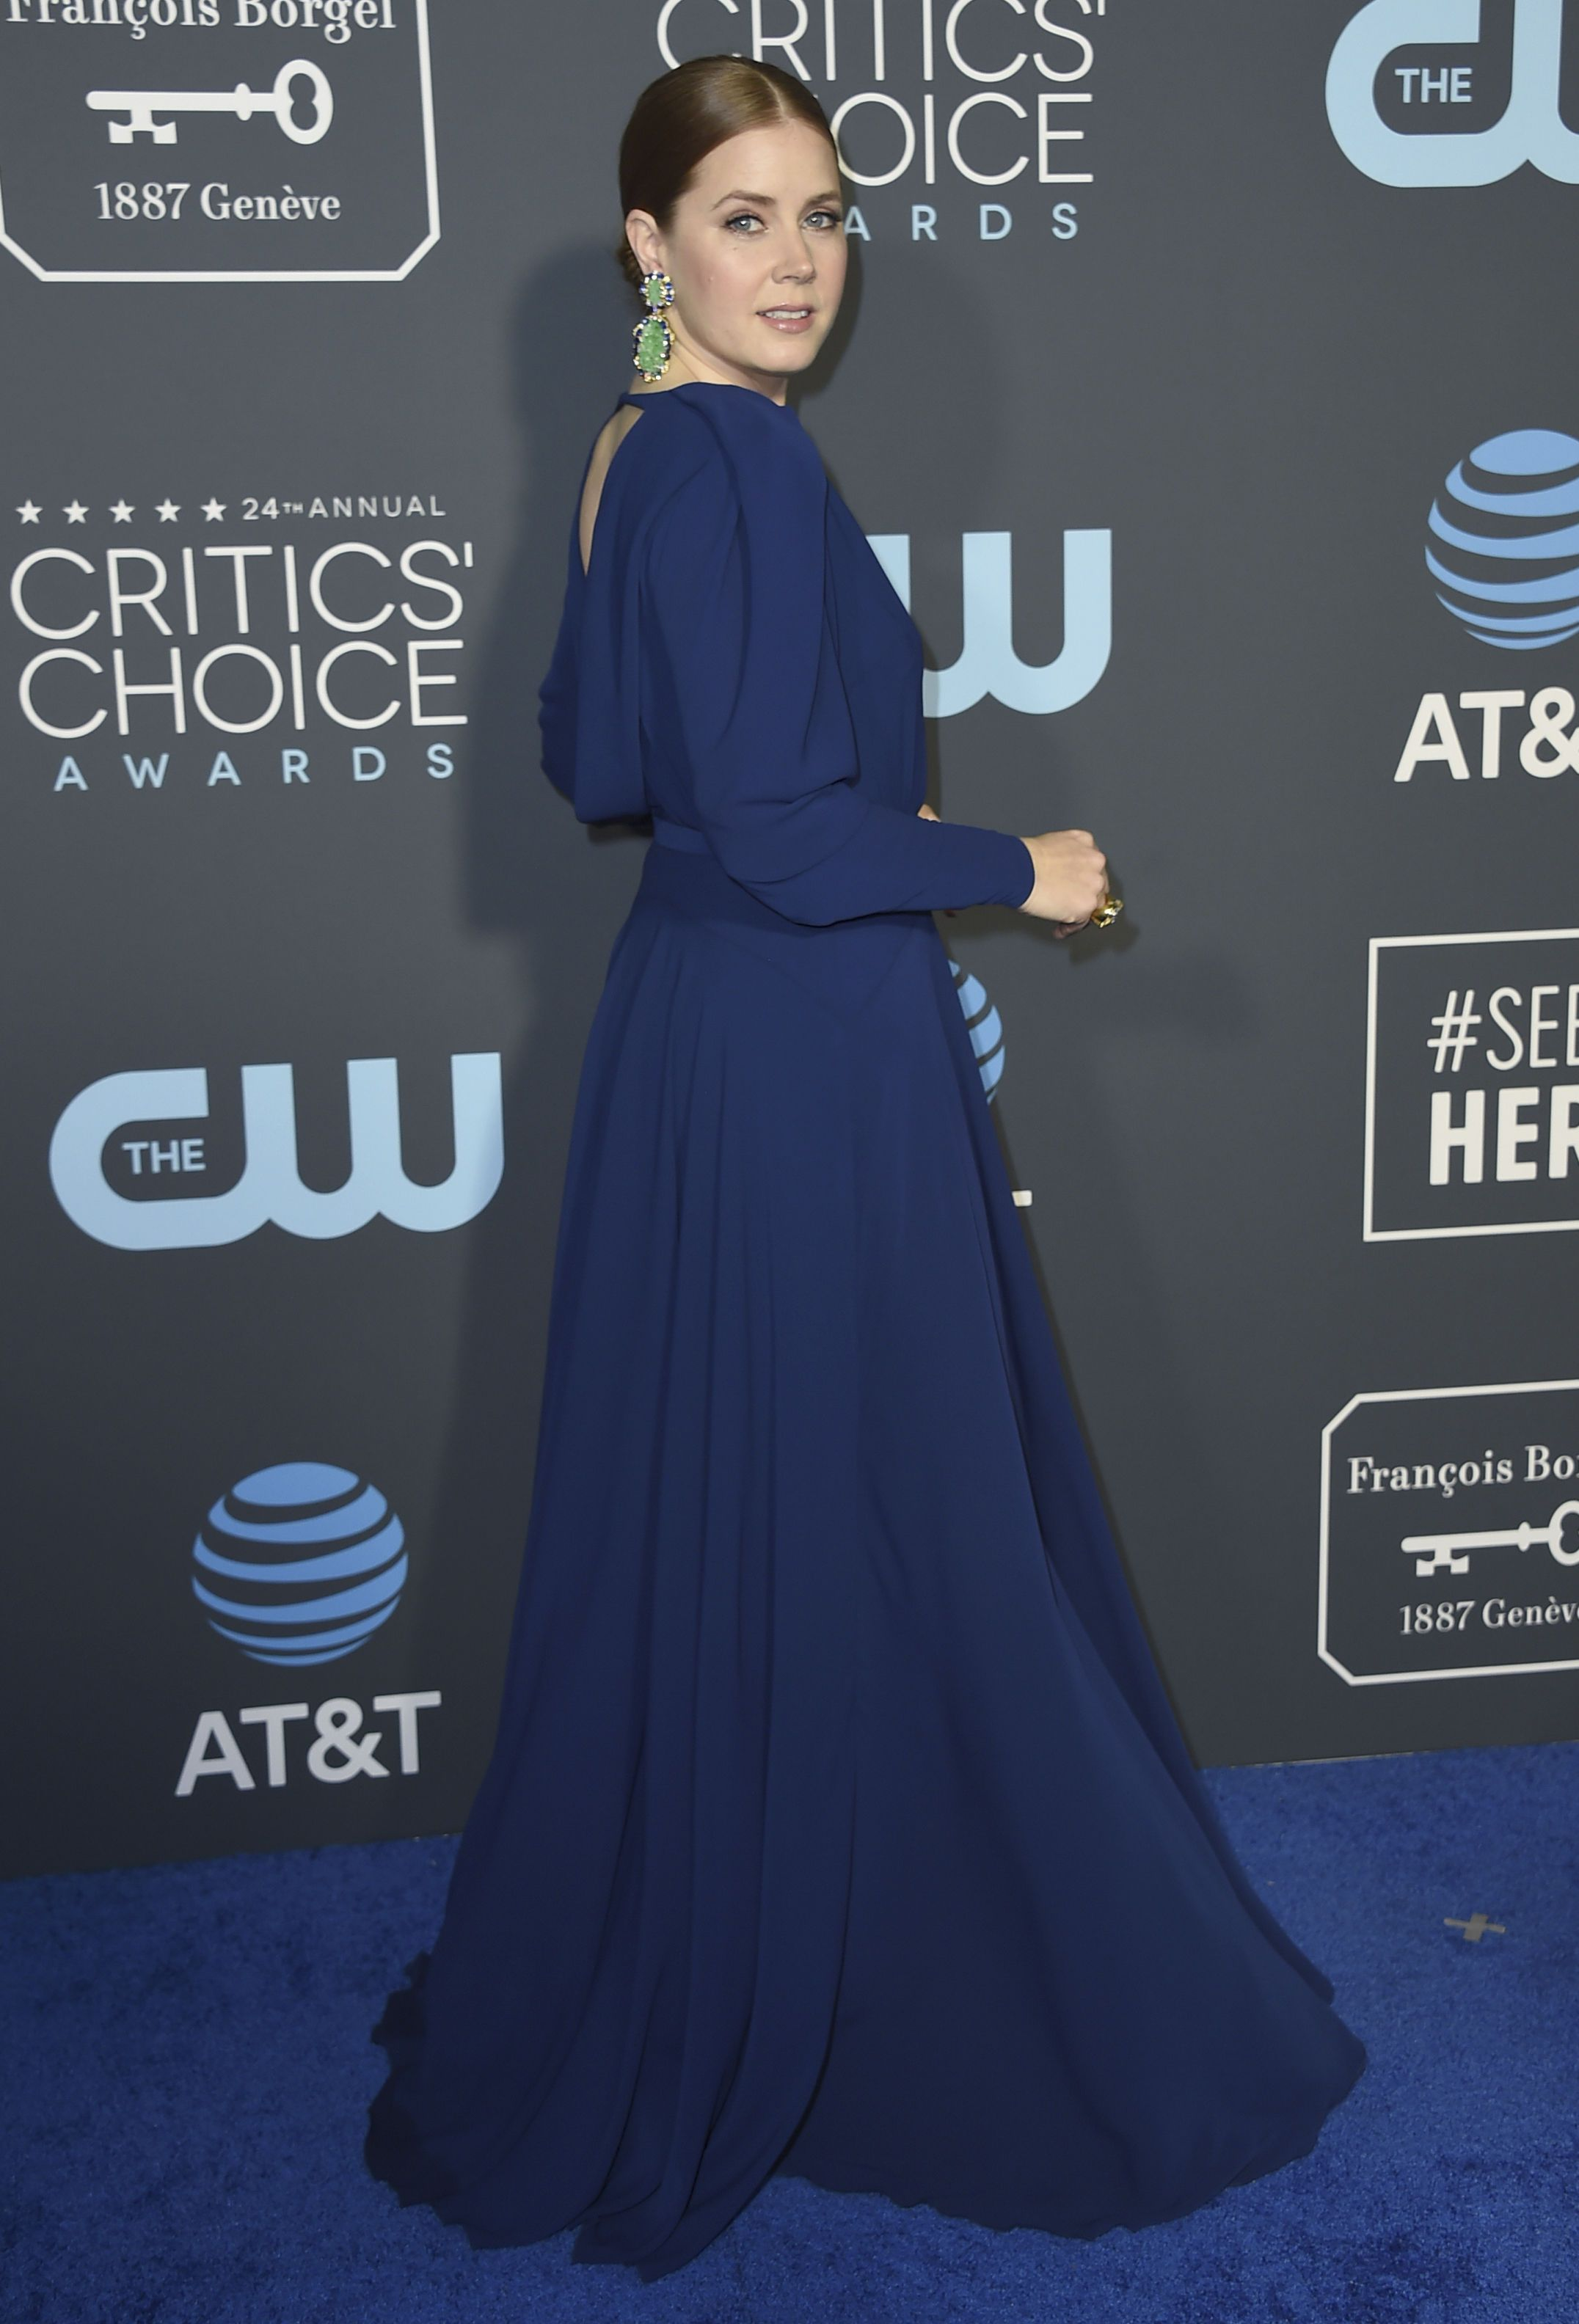 Critics 'Choice Awards_13